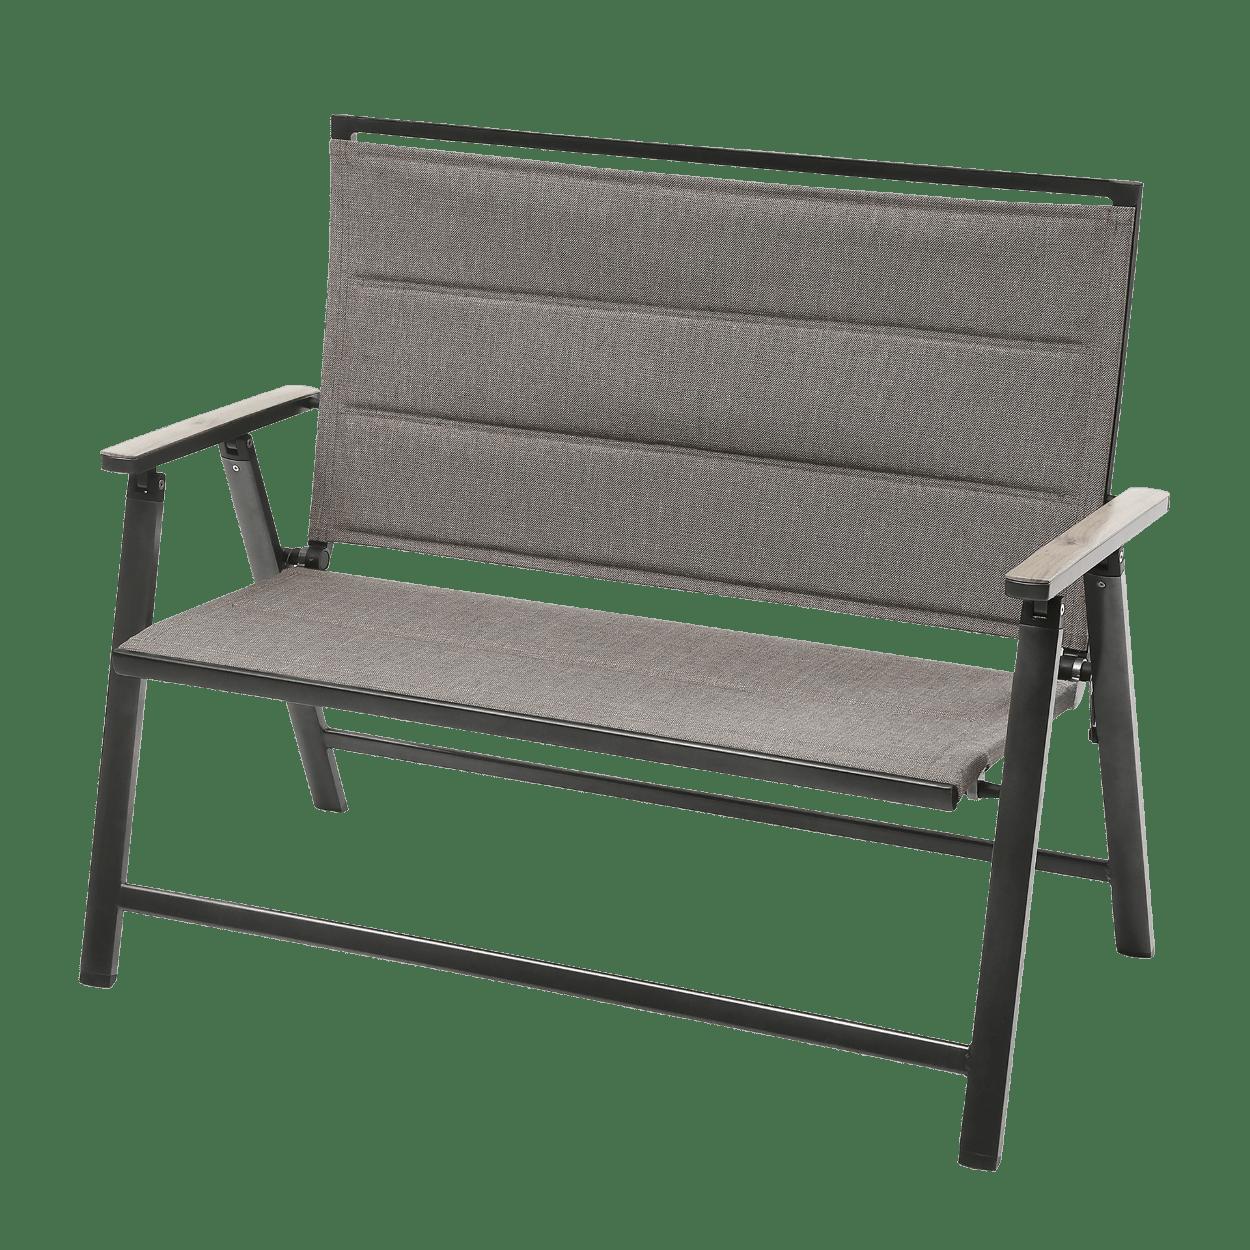 Full Size of Aldi Gartenbank Geflecht Rattan 2019 Klappbar 2020 2018 Aluminium 2017 Alu Kinder Relaxsessel Garten Wohnzimmer Aldi Gartenbank